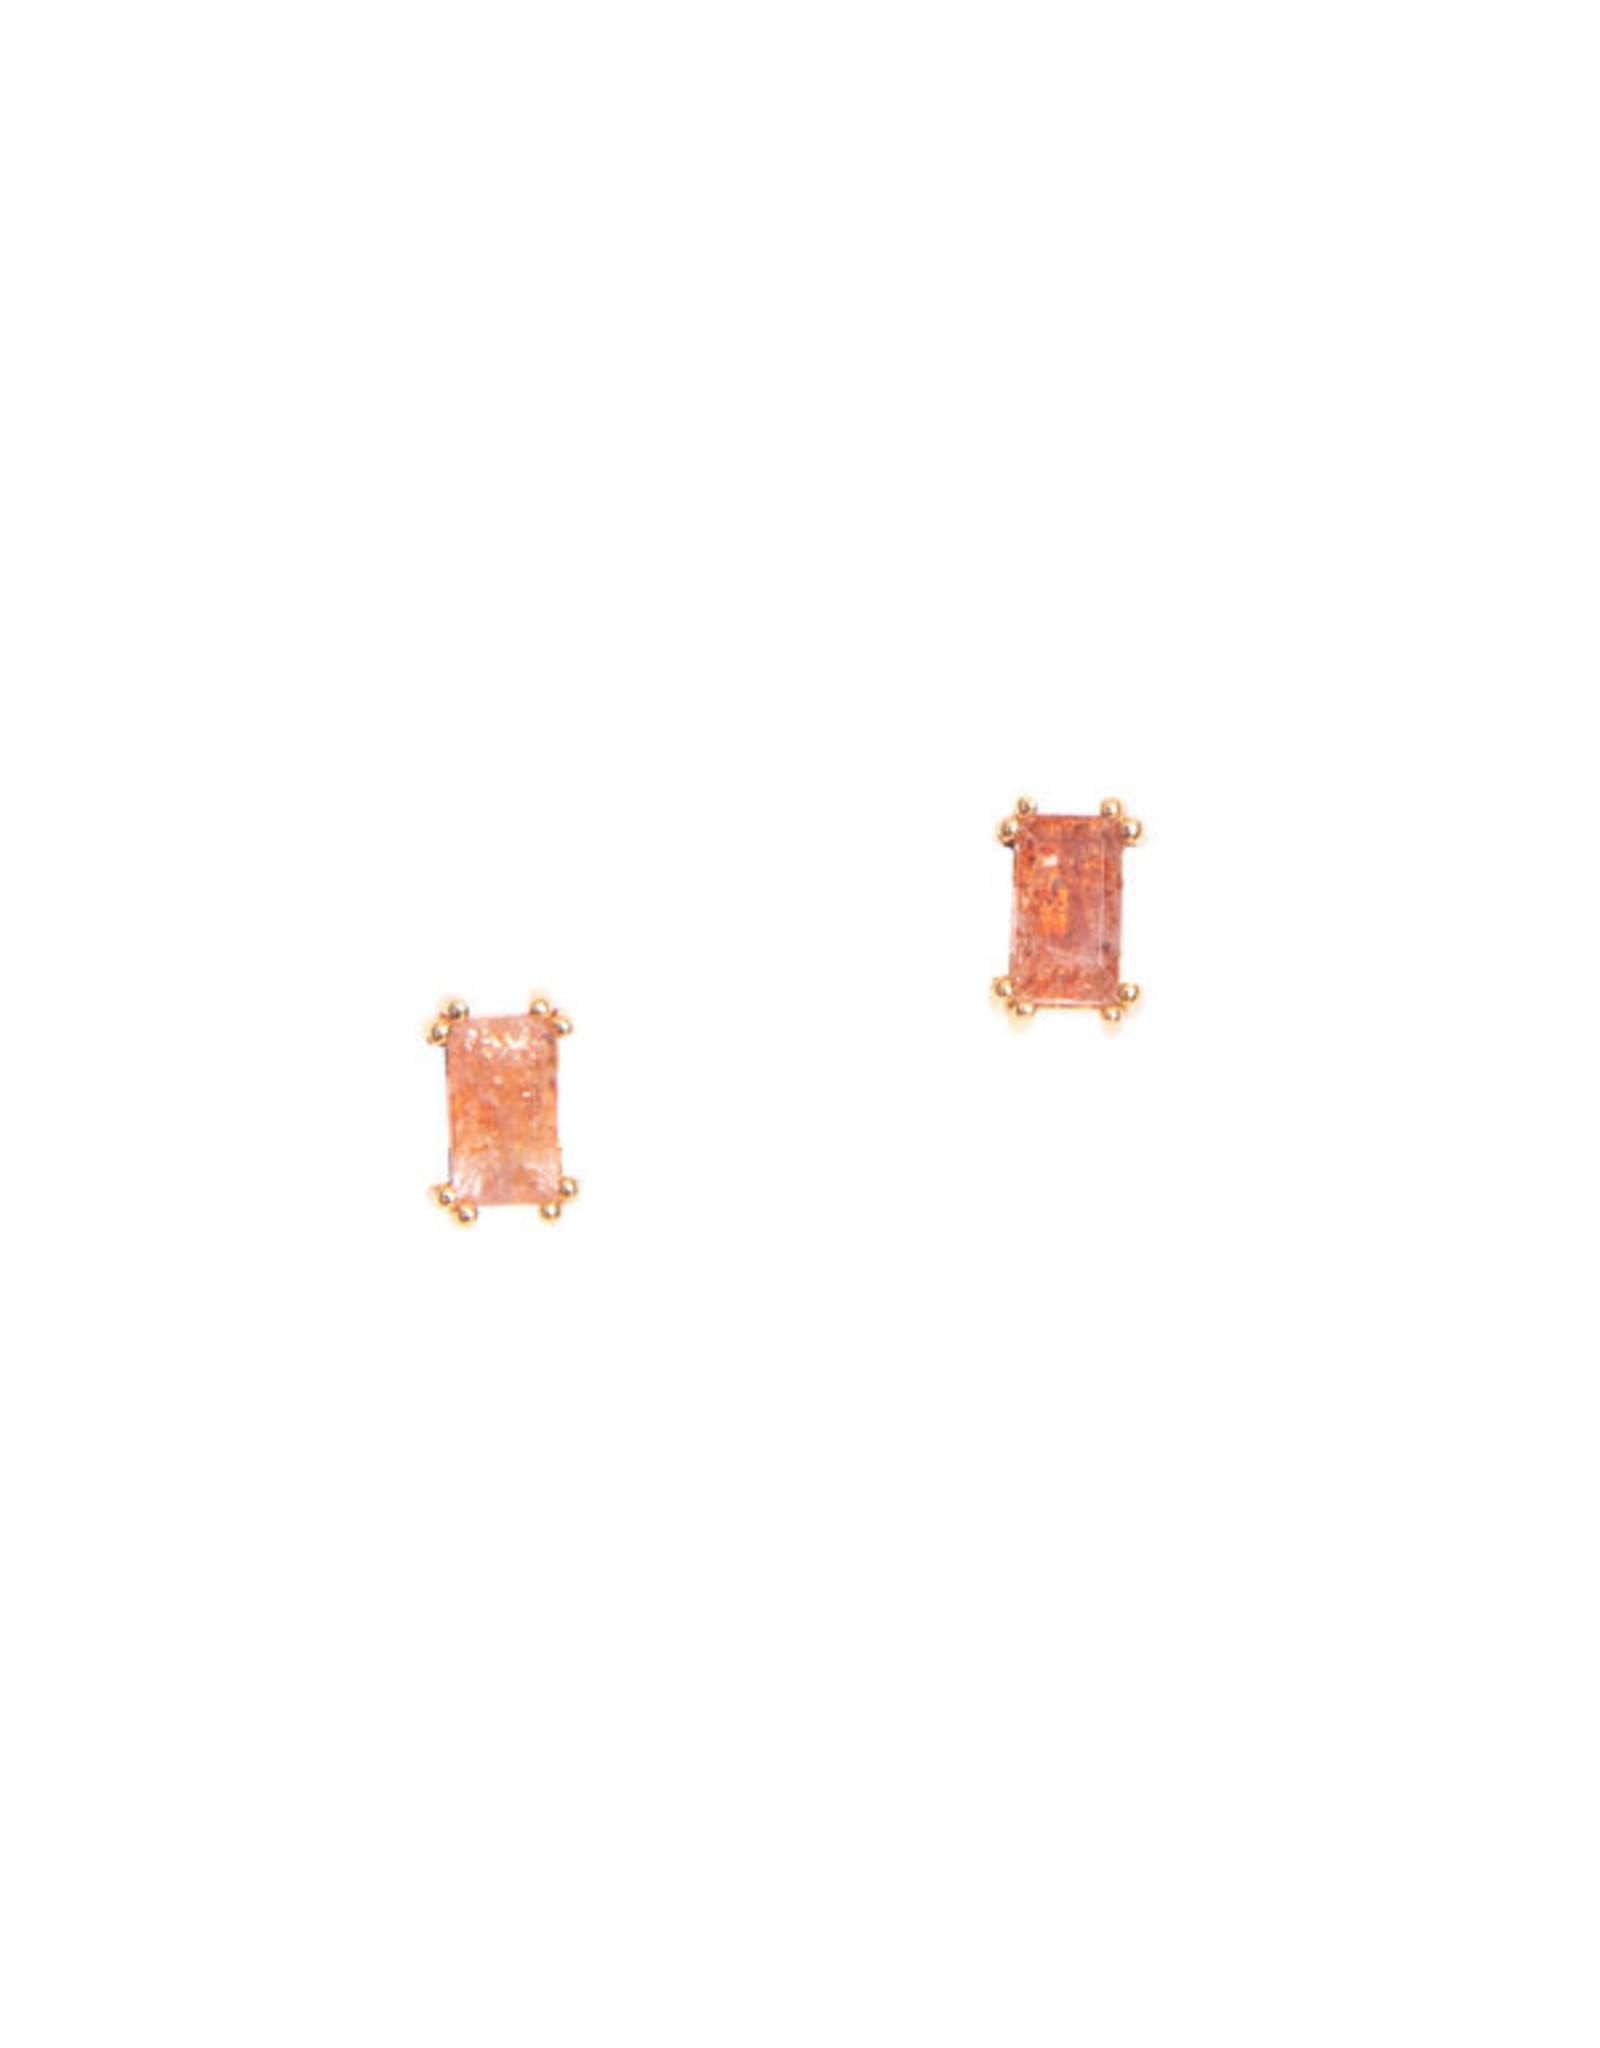 Hailey Gerrits Designs Baguette Studs - Sunstone